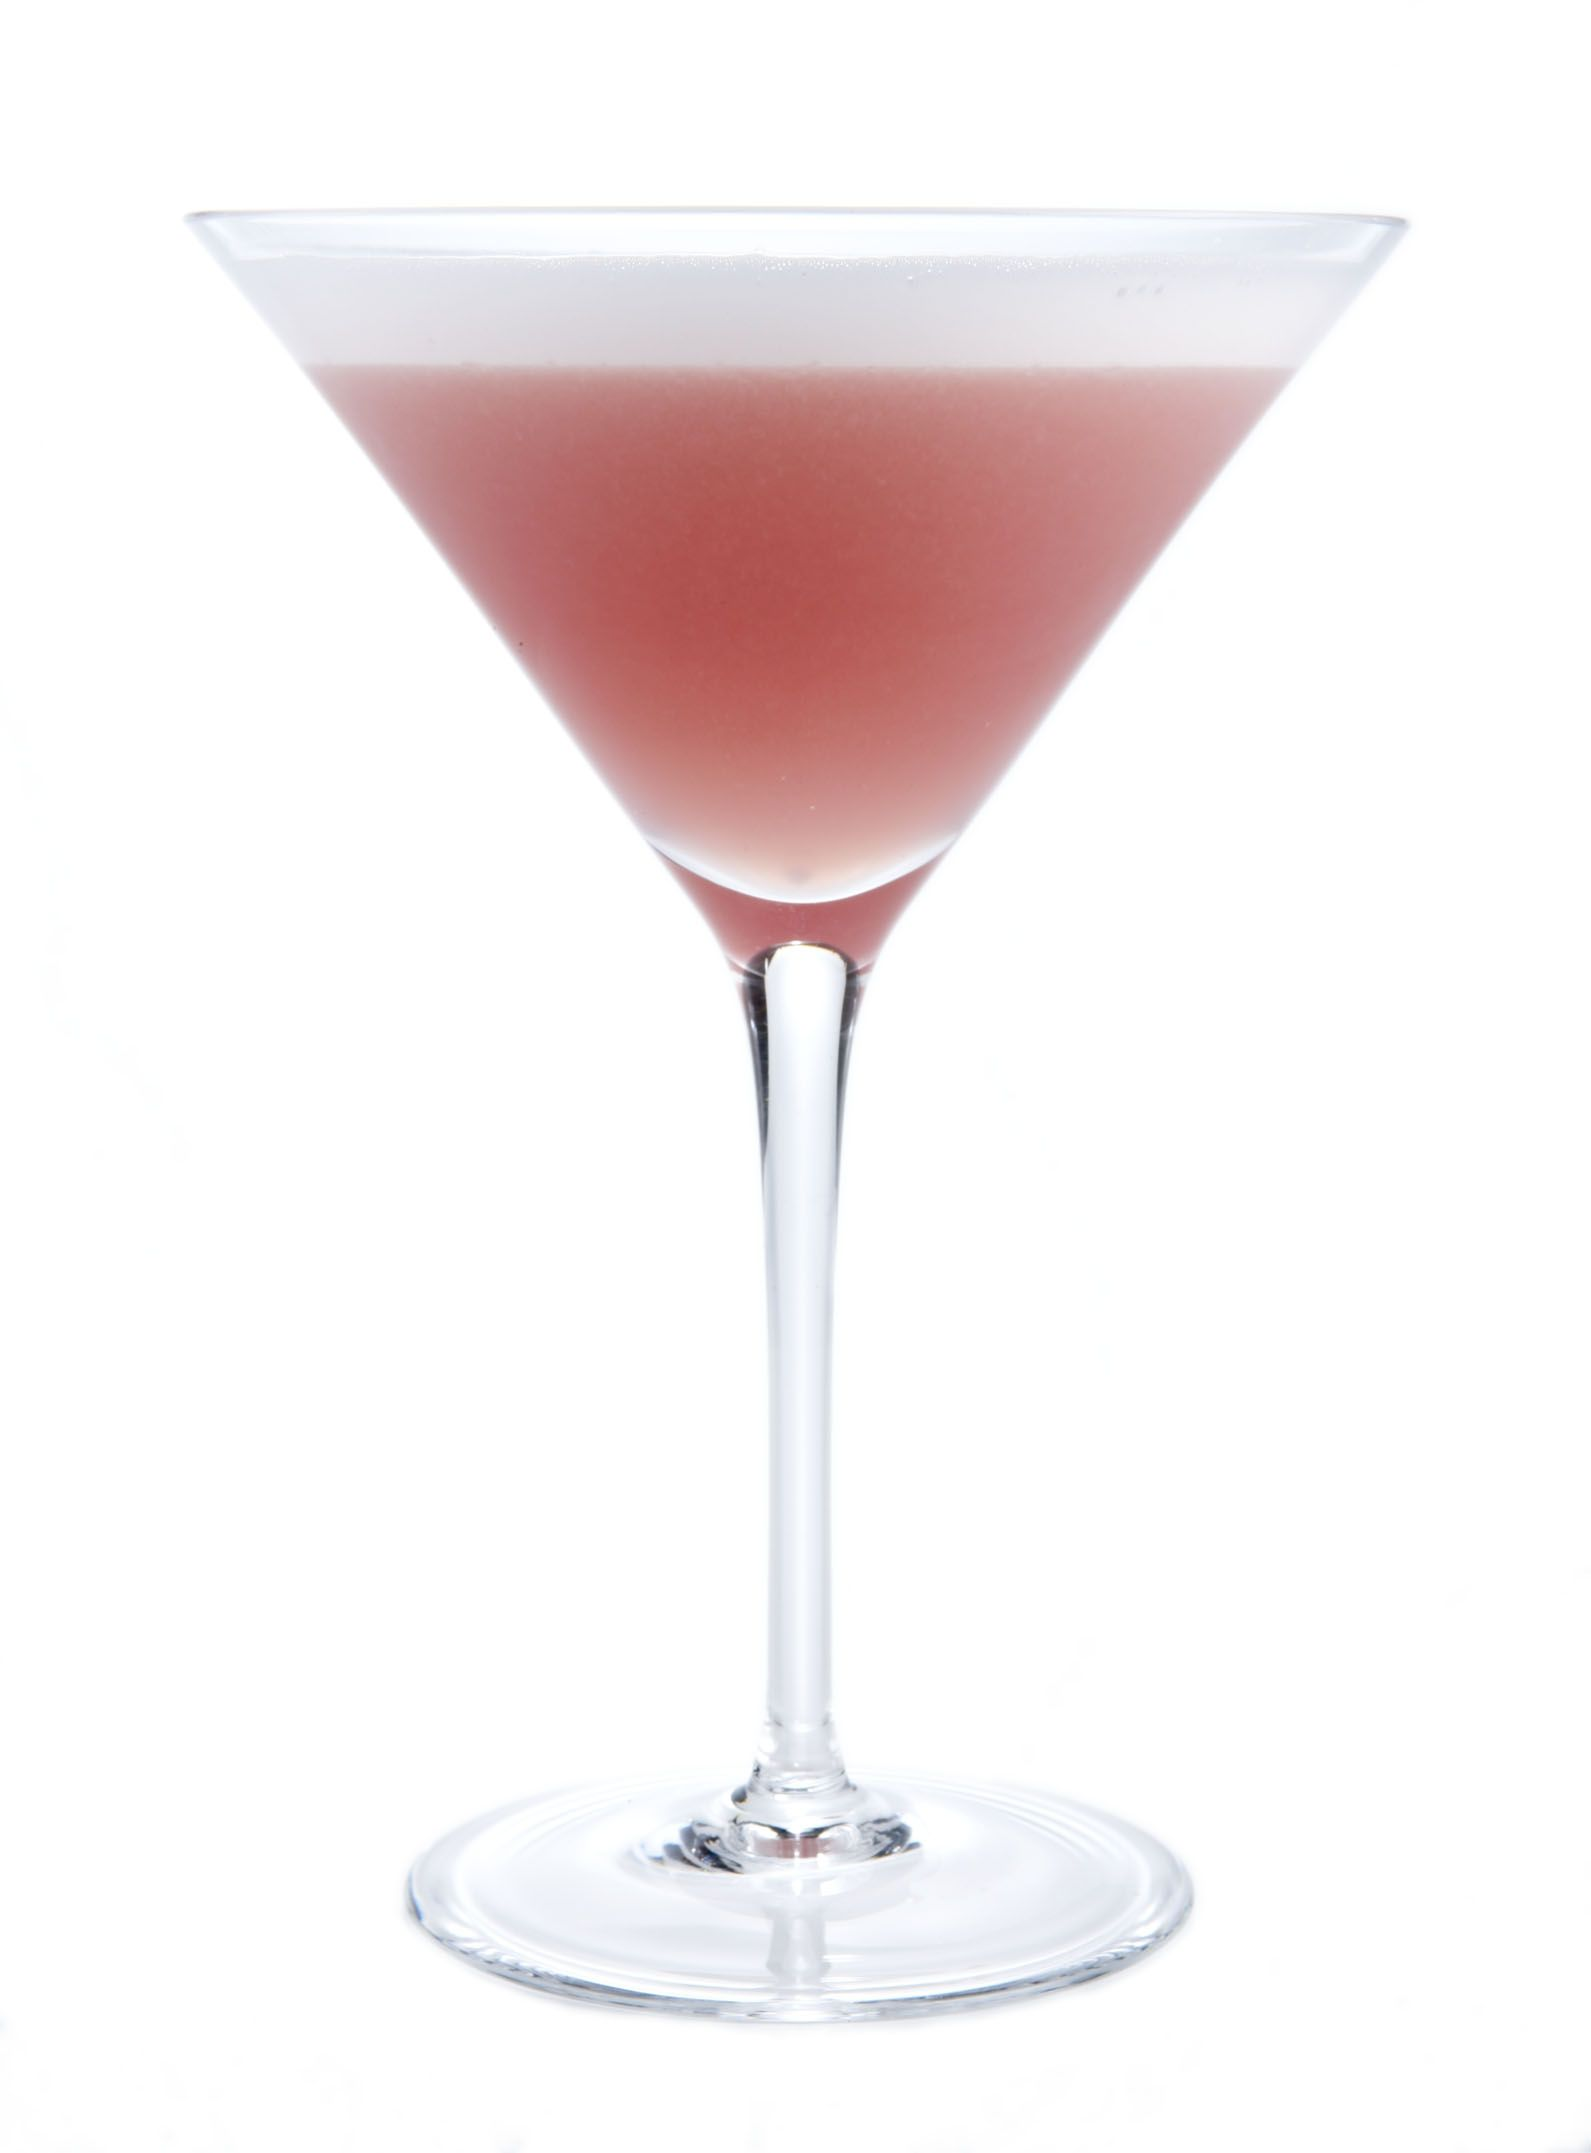 clover-club-cocktail.jpg